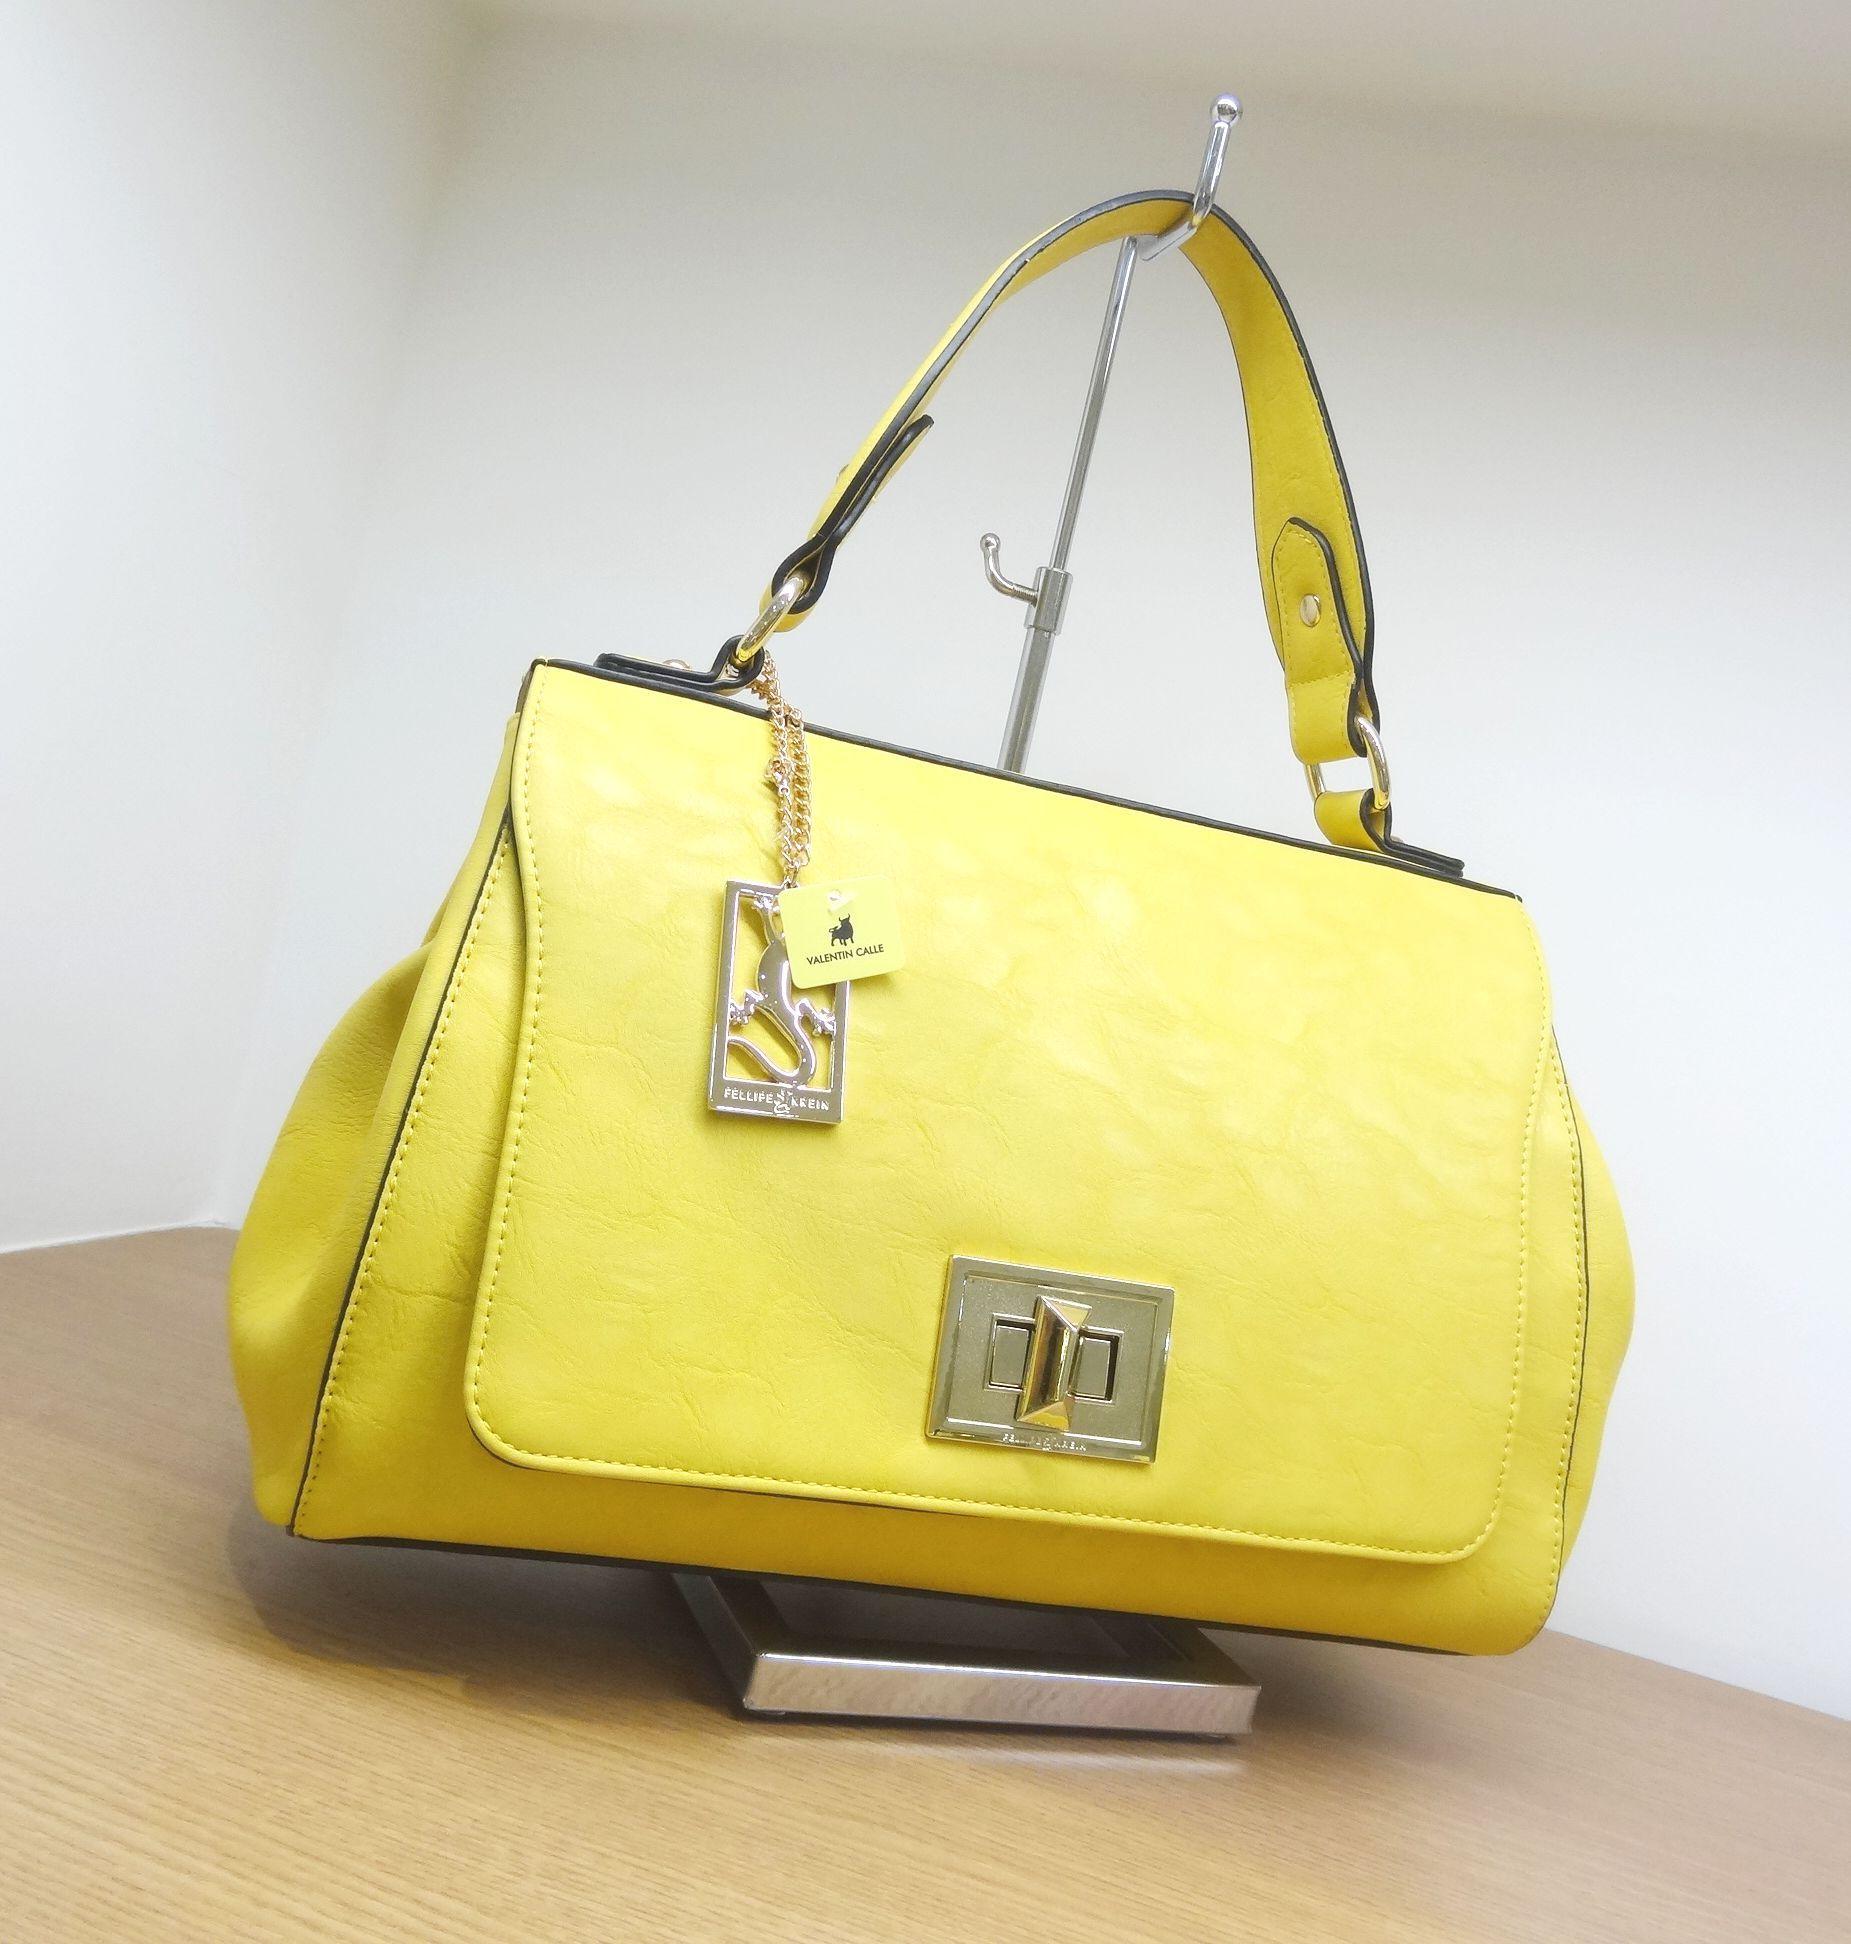 5c402c26e Bolsa Moderna Amarela Fellipe Krein em Loja Valentin Calle.   Bolsas ...